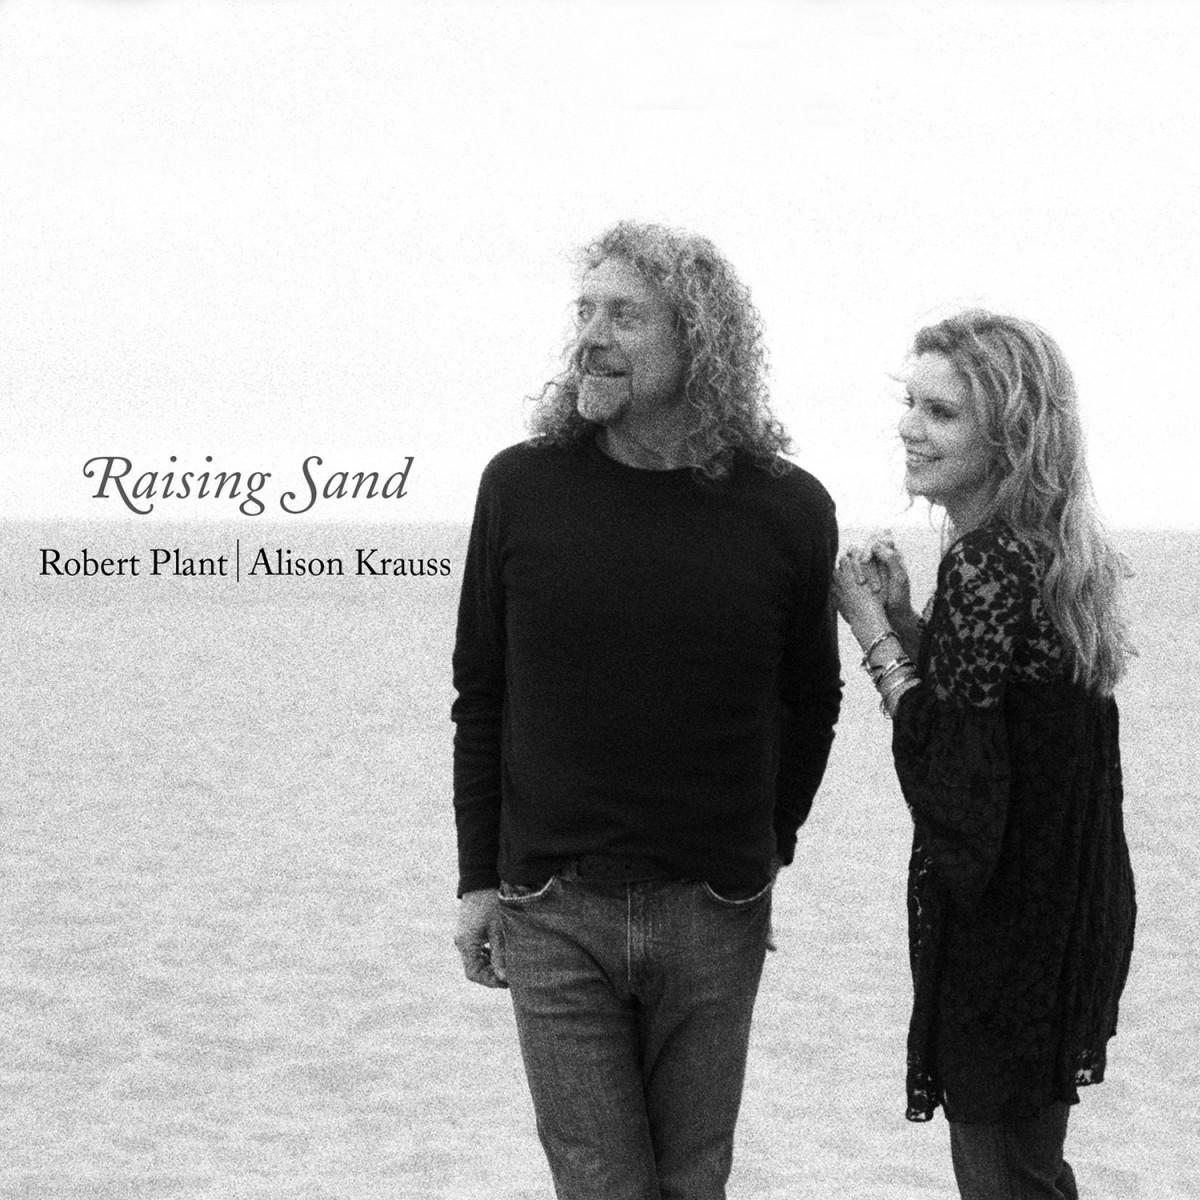 Plant, Robert and Krauss, Alison: Raising Sand (2007)